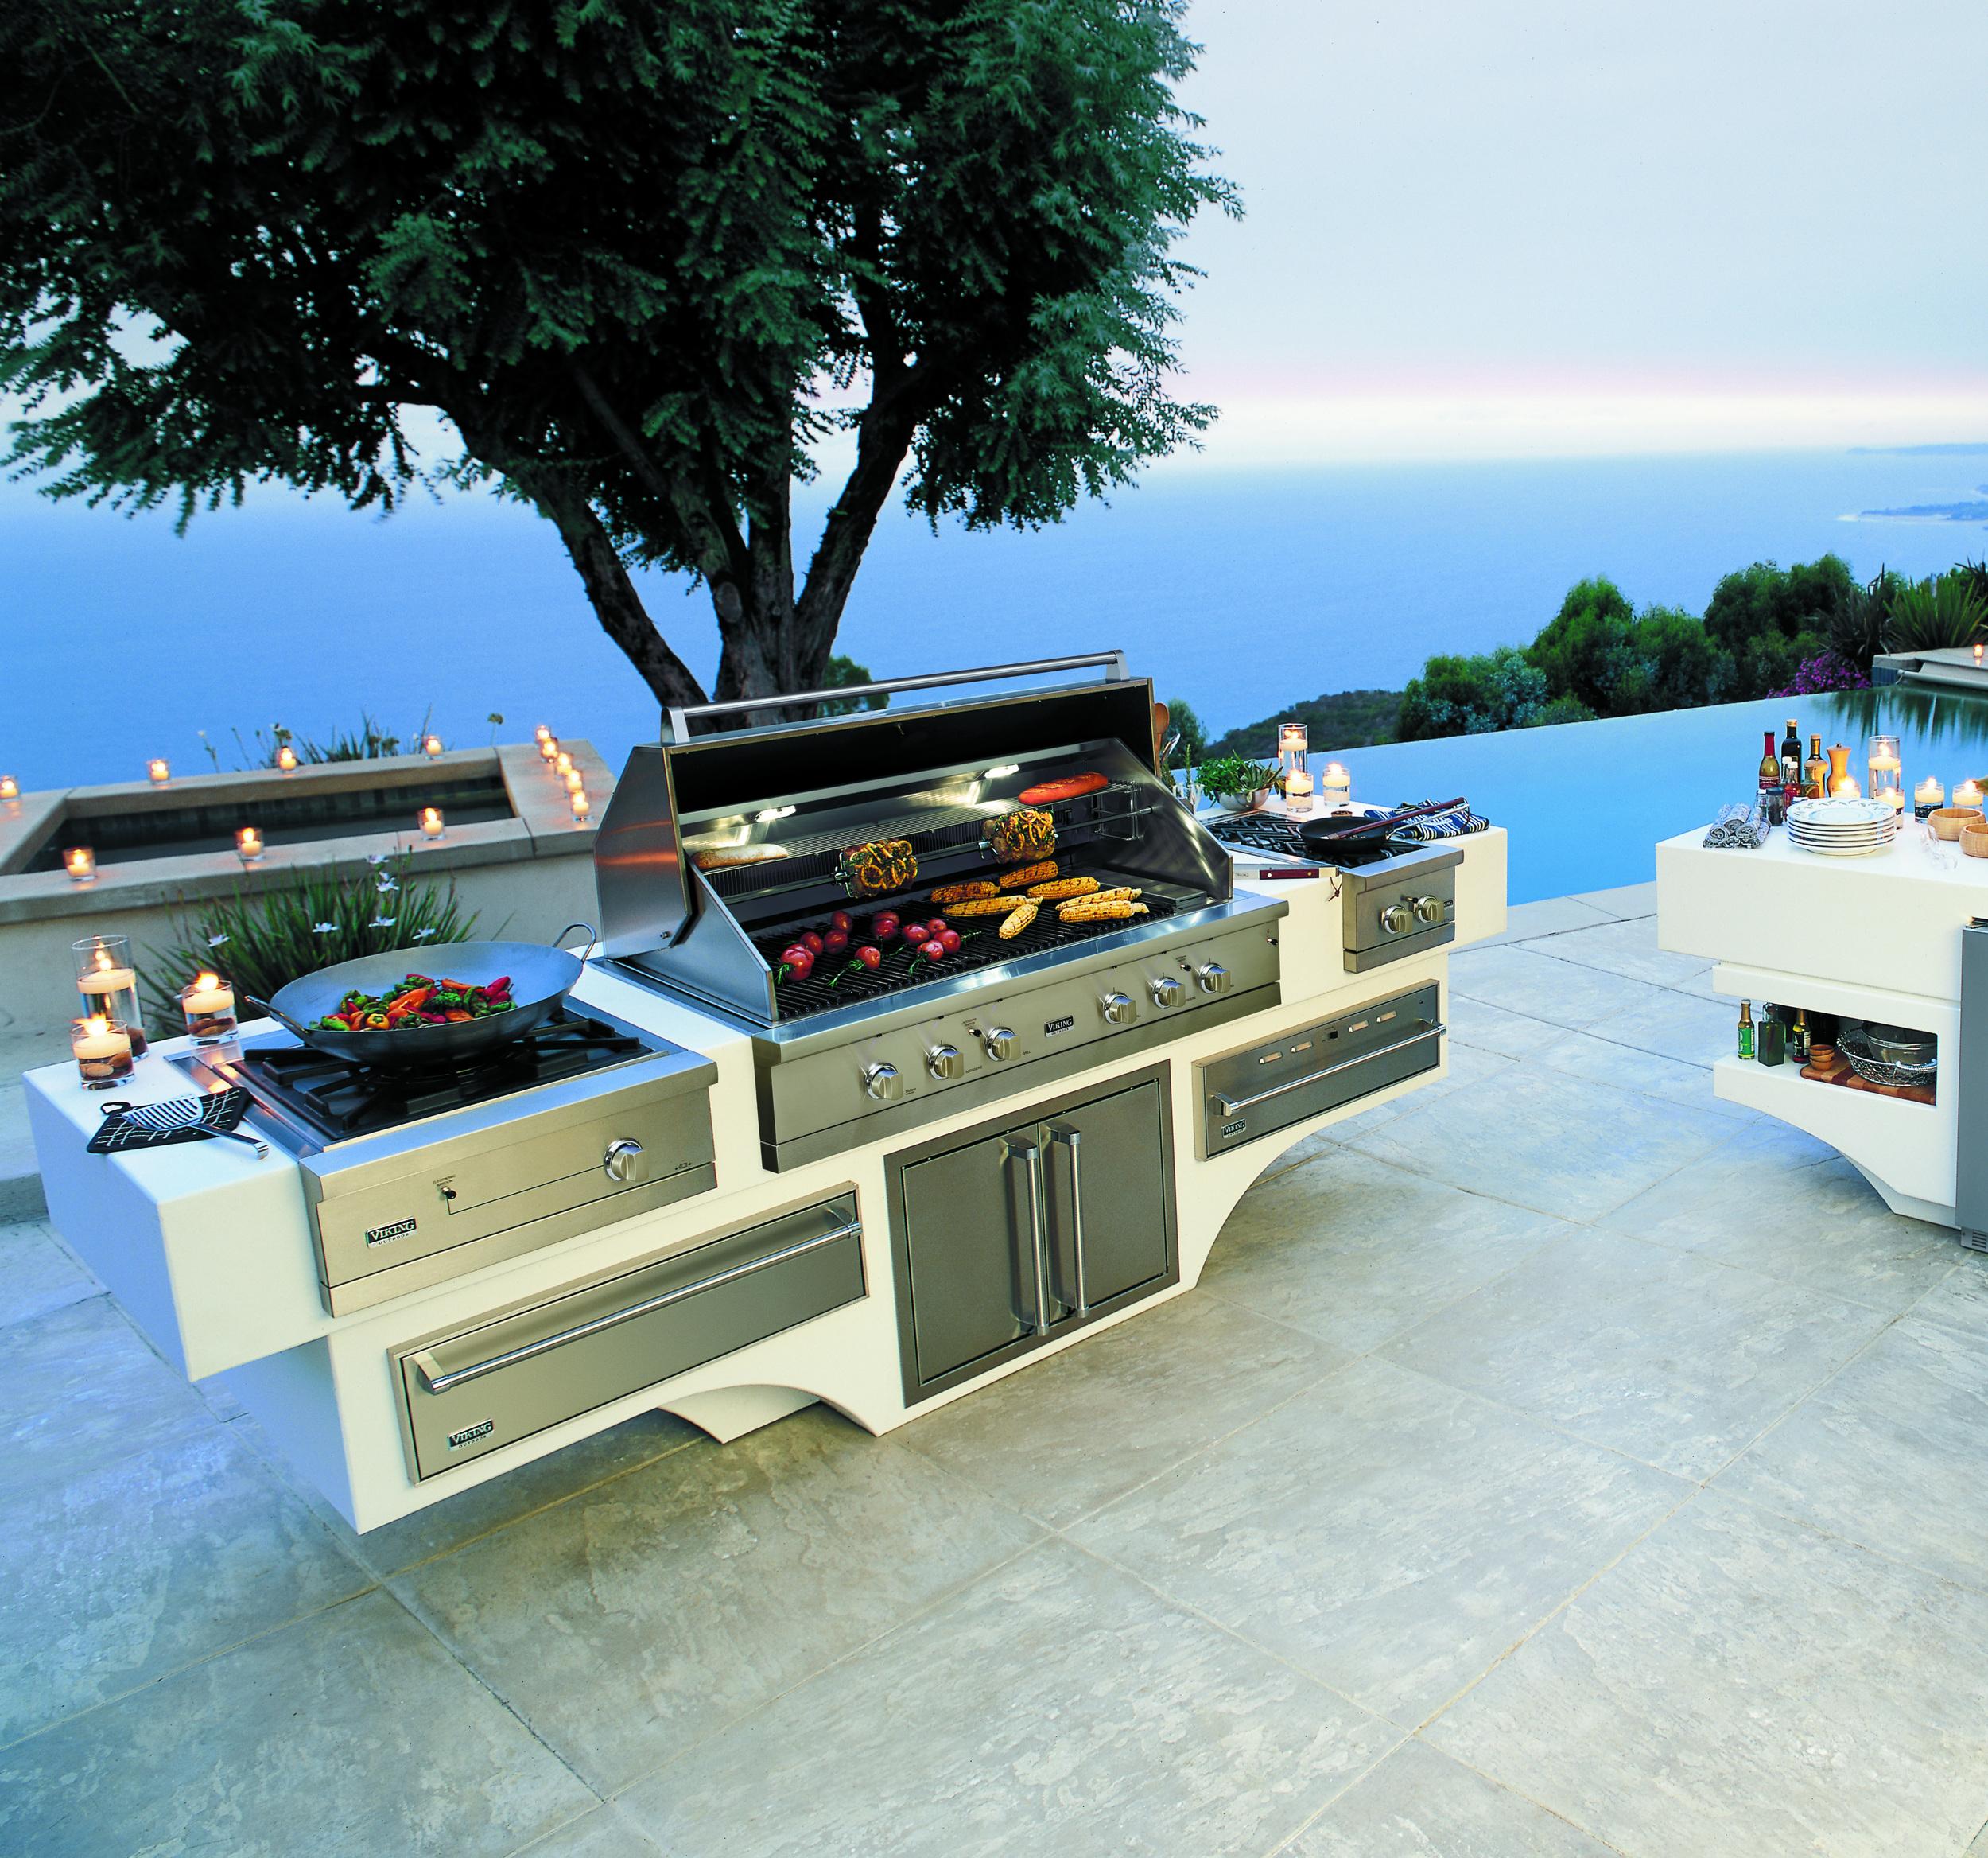 Viking offers modernist outdoor designs